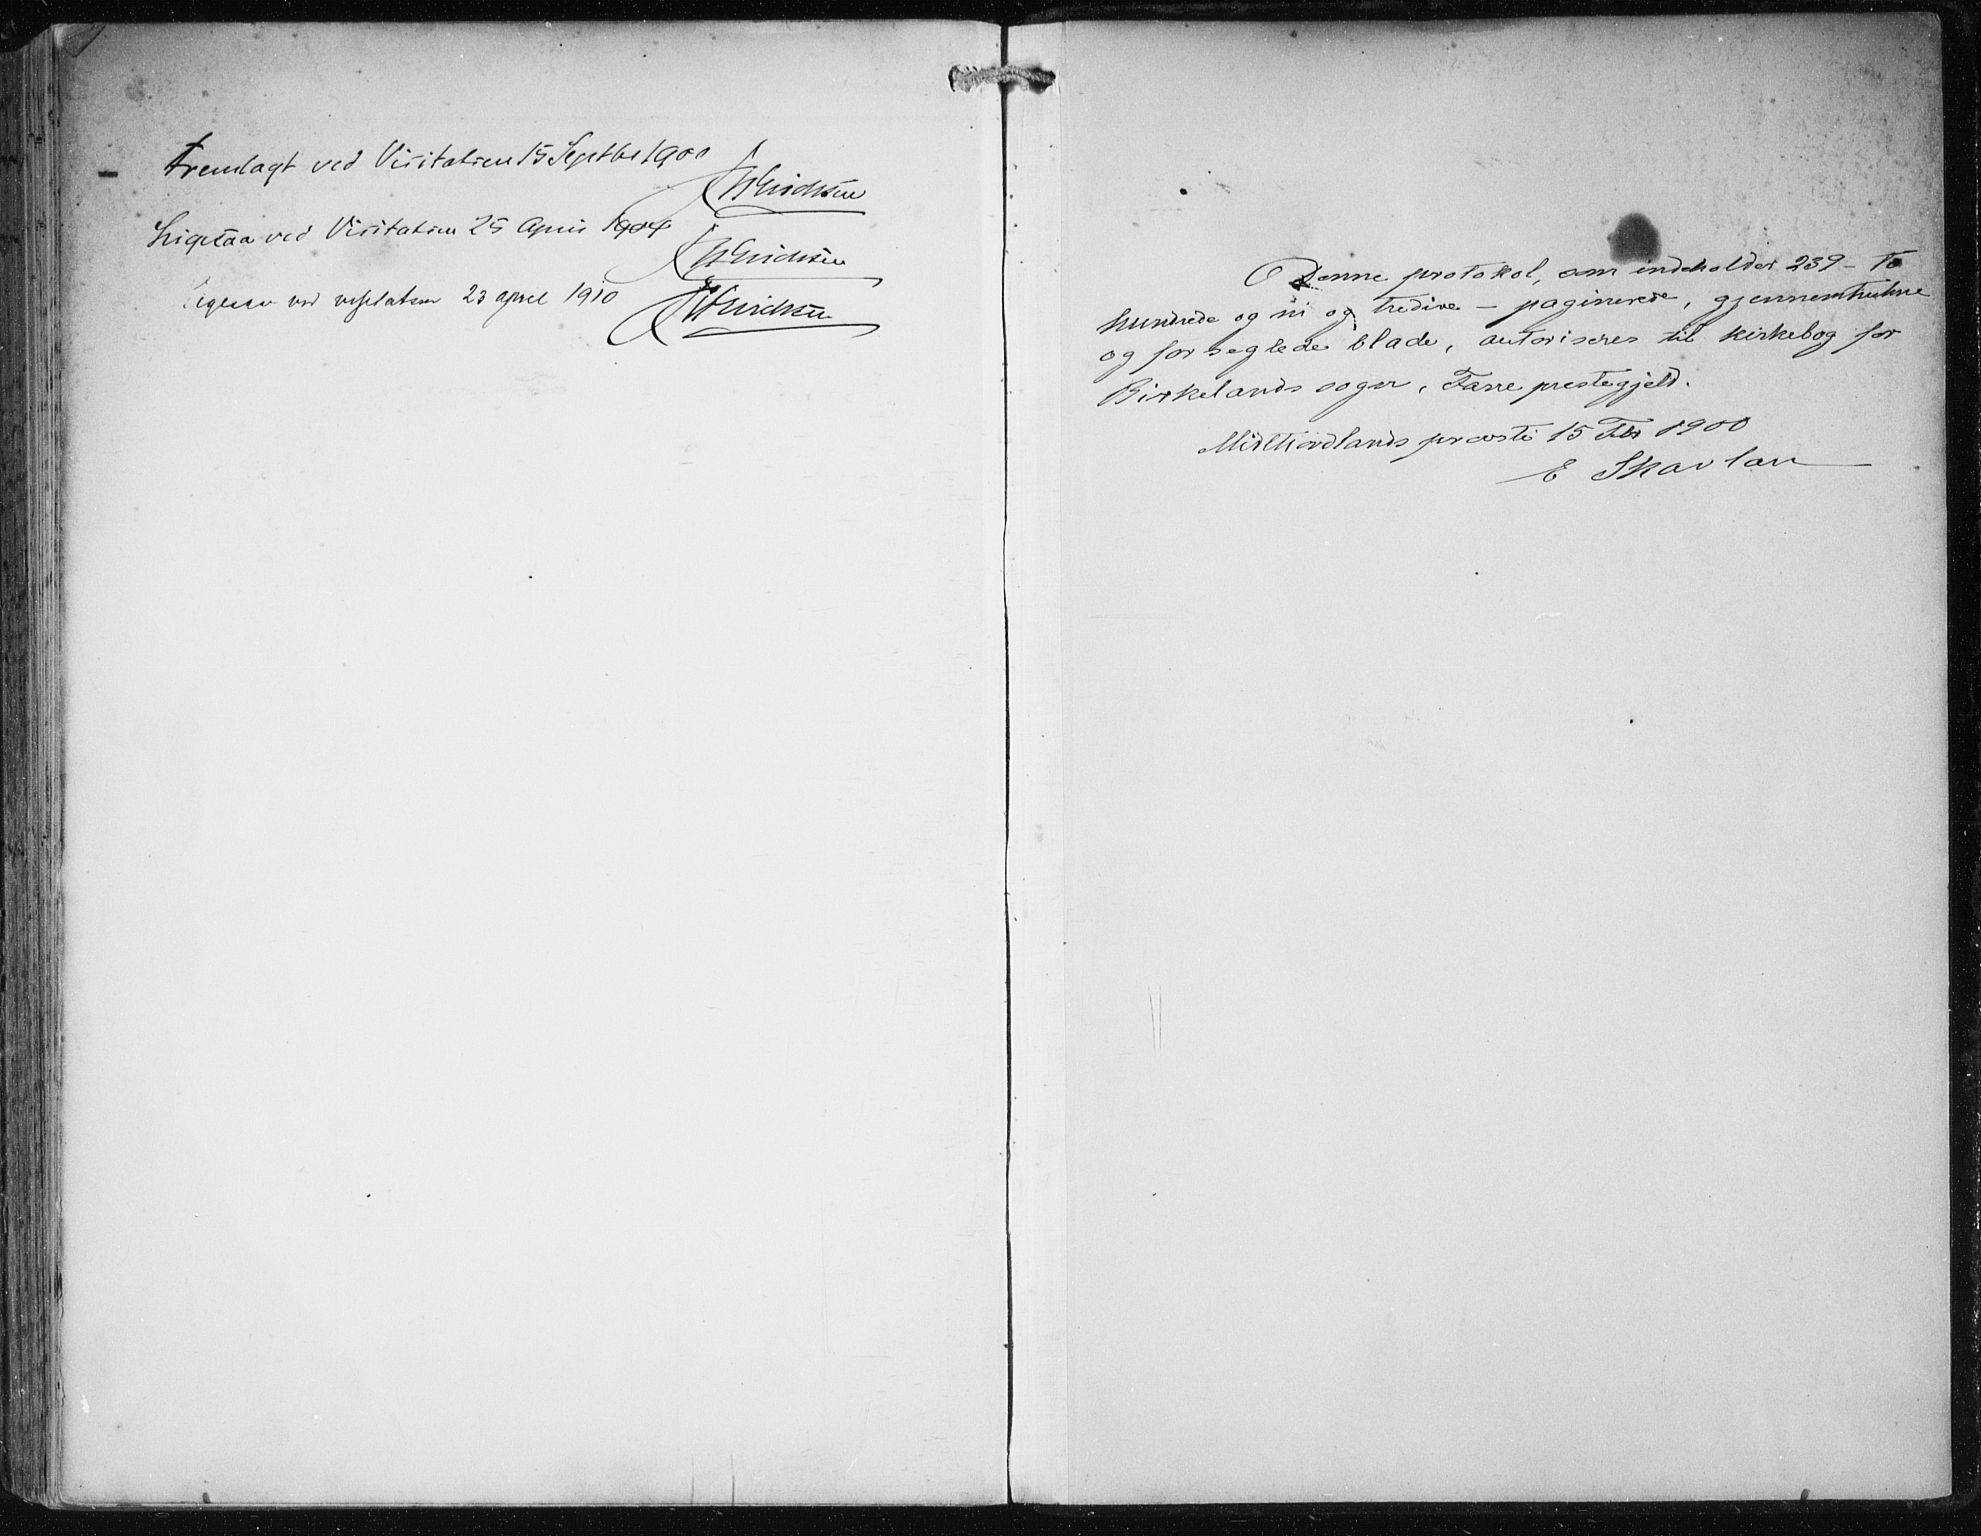 SAB, Fana Sokneprestembete, H/Haa/Haai/L0003: Ministerialbok nr. I 3, 1900-1912